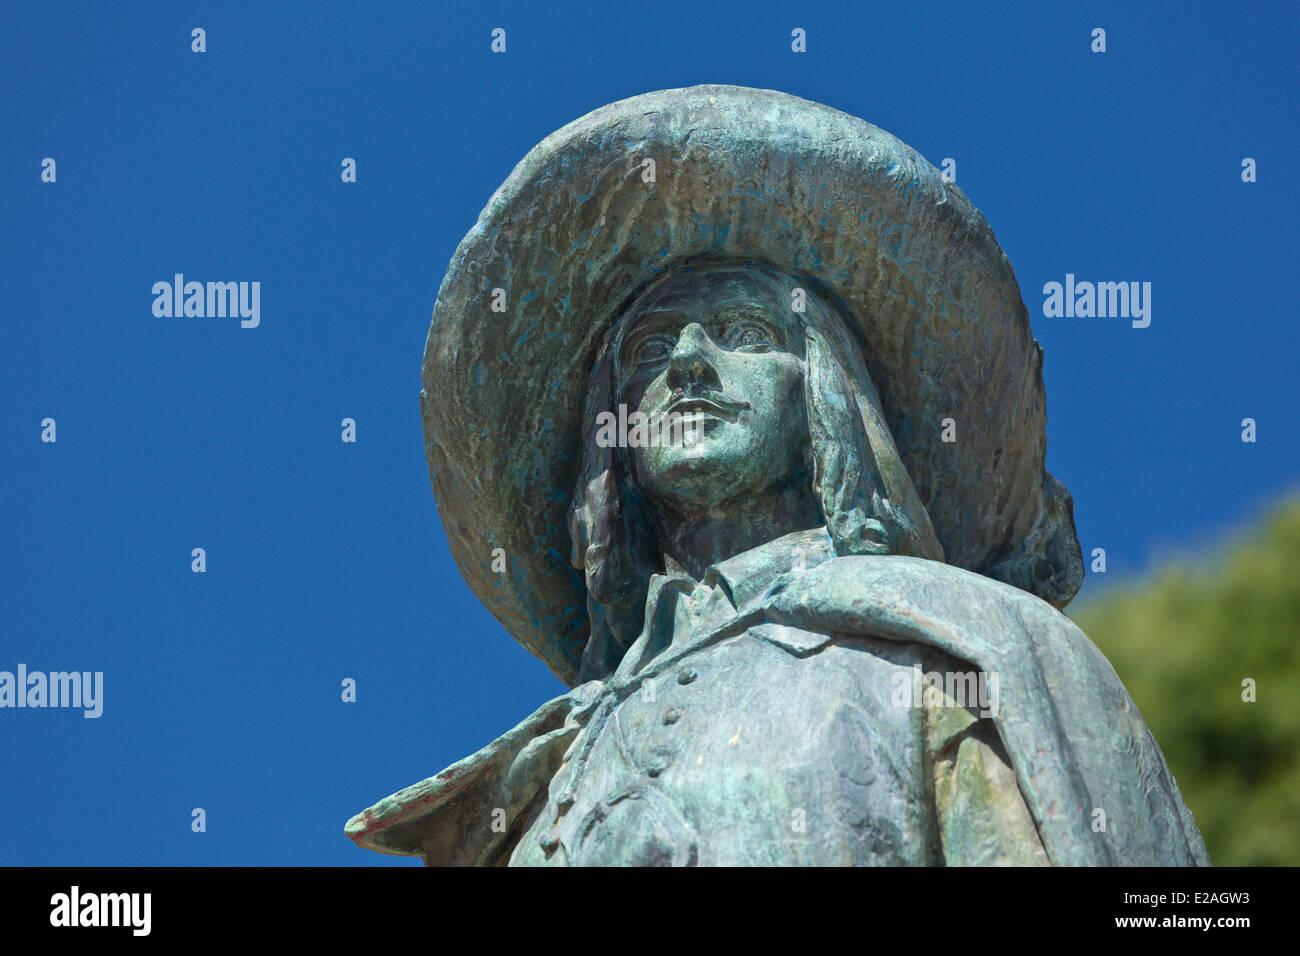 France, Gers, Auch, stop on El Camino de Santiago, D'Artagnan statue - Stock Image